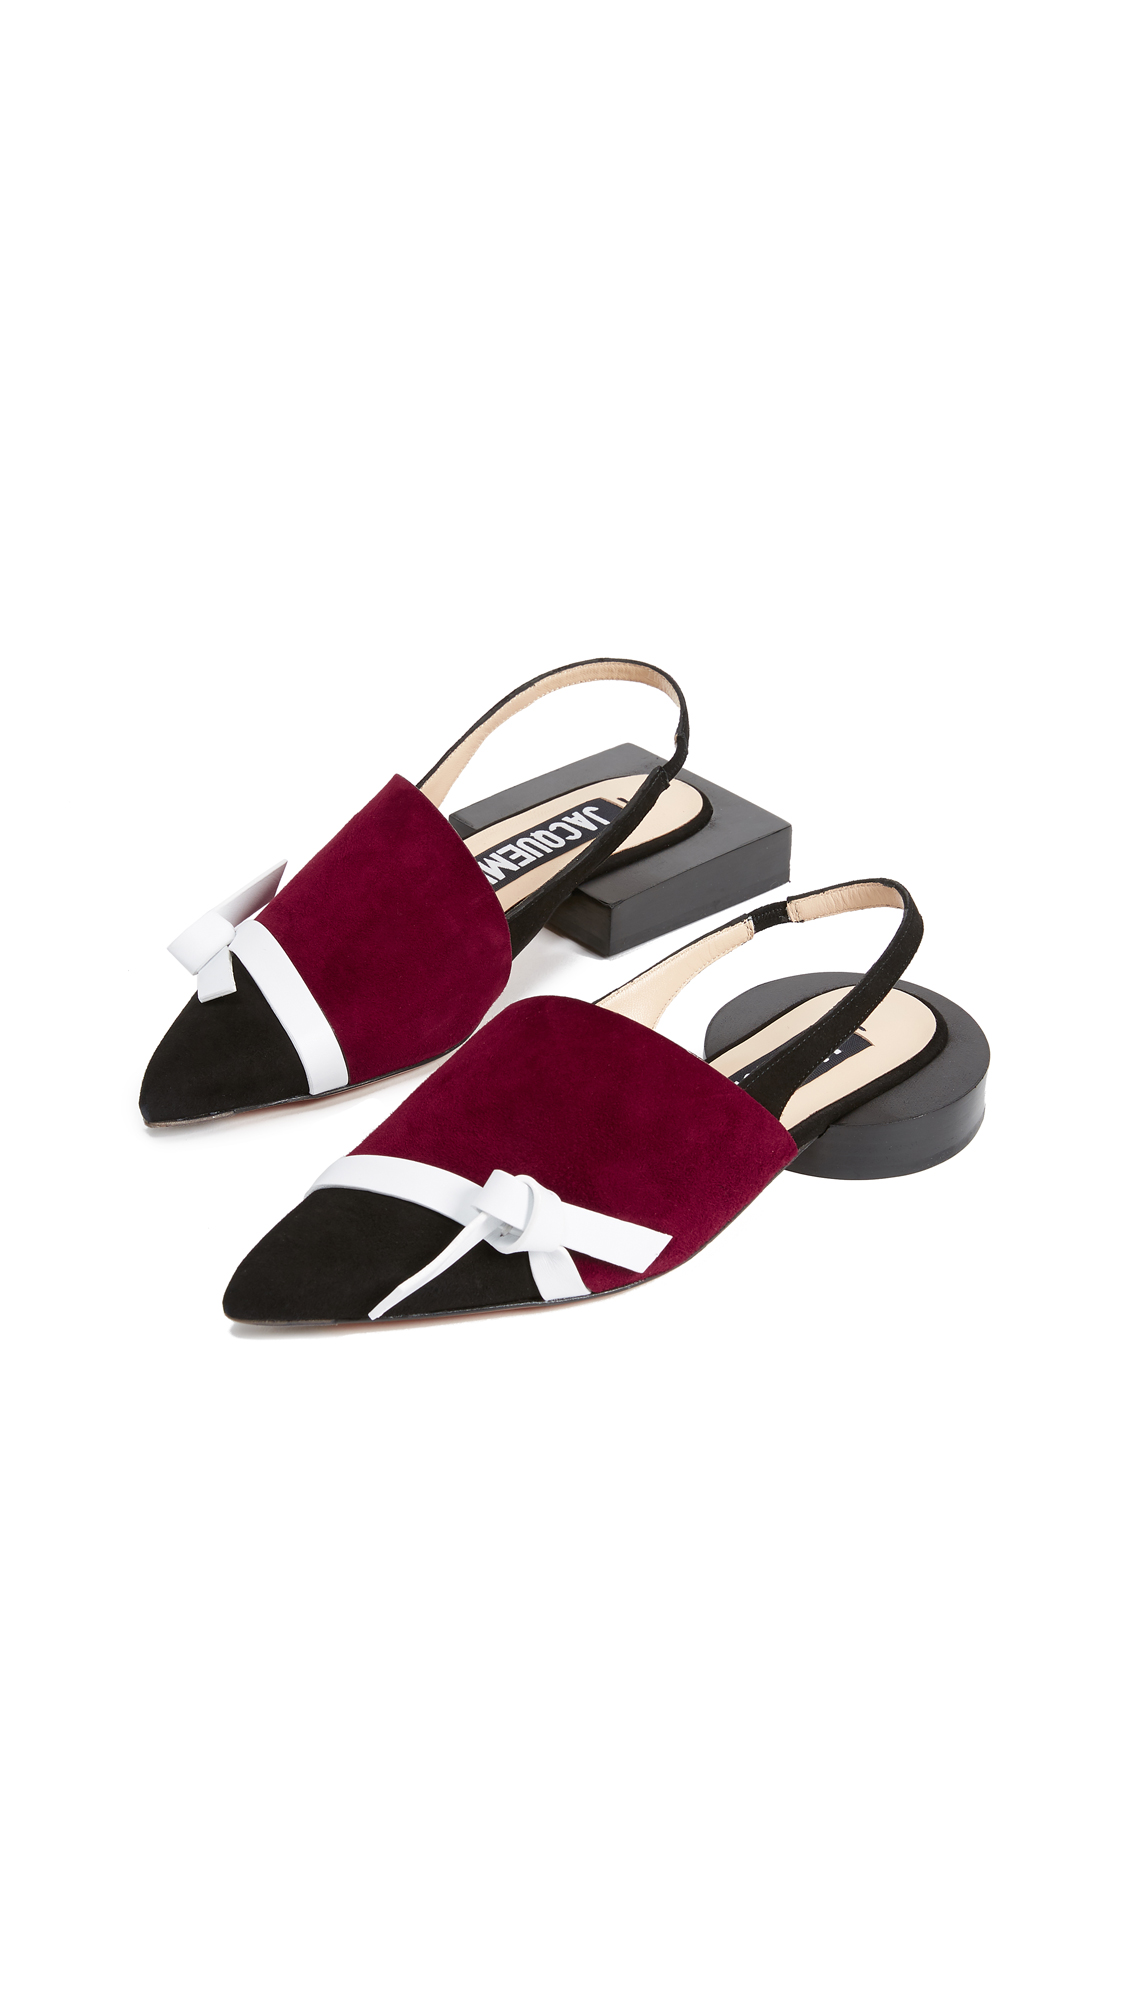 Jacquemus Les Espagne Sandals - Black/Burgundy/White